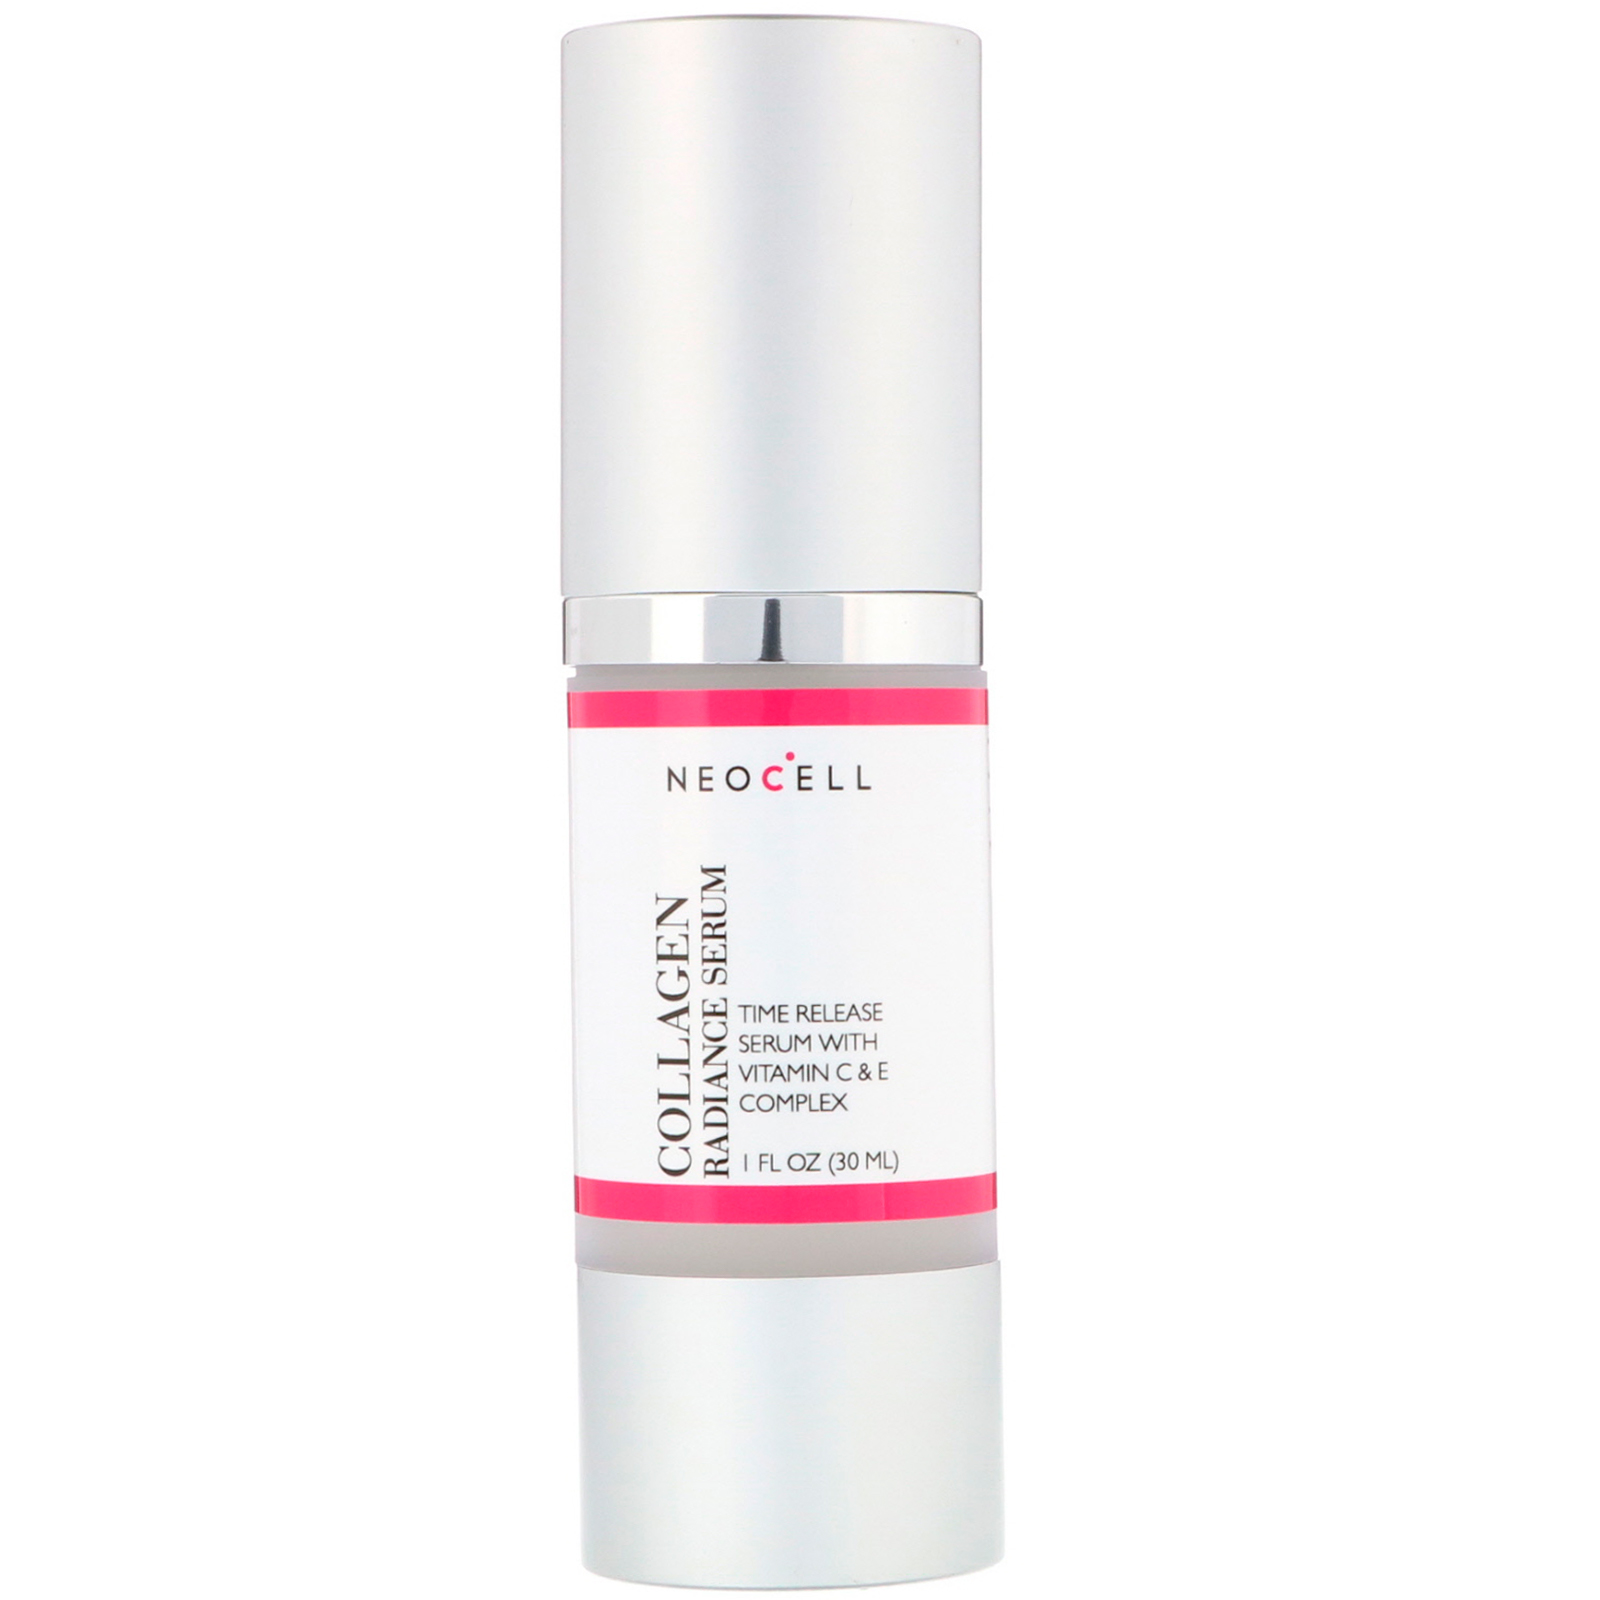 Neocell, Collagen Radiance Serum, 1 fl oz (30 ml) (Discontinued Item)